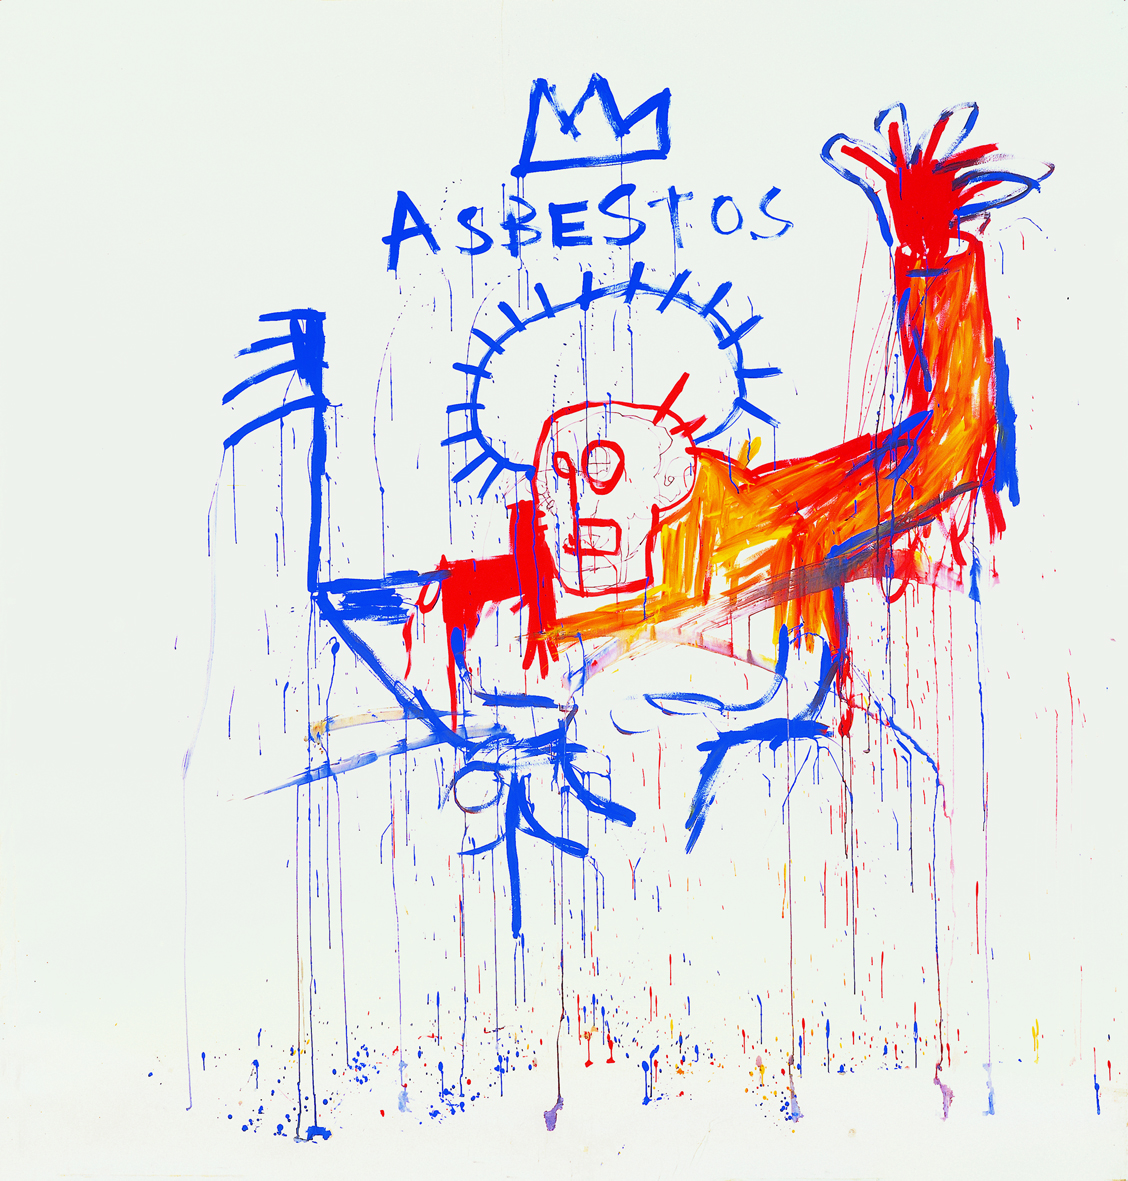 2012-07-18-Basquiat_Asbestos.jpg